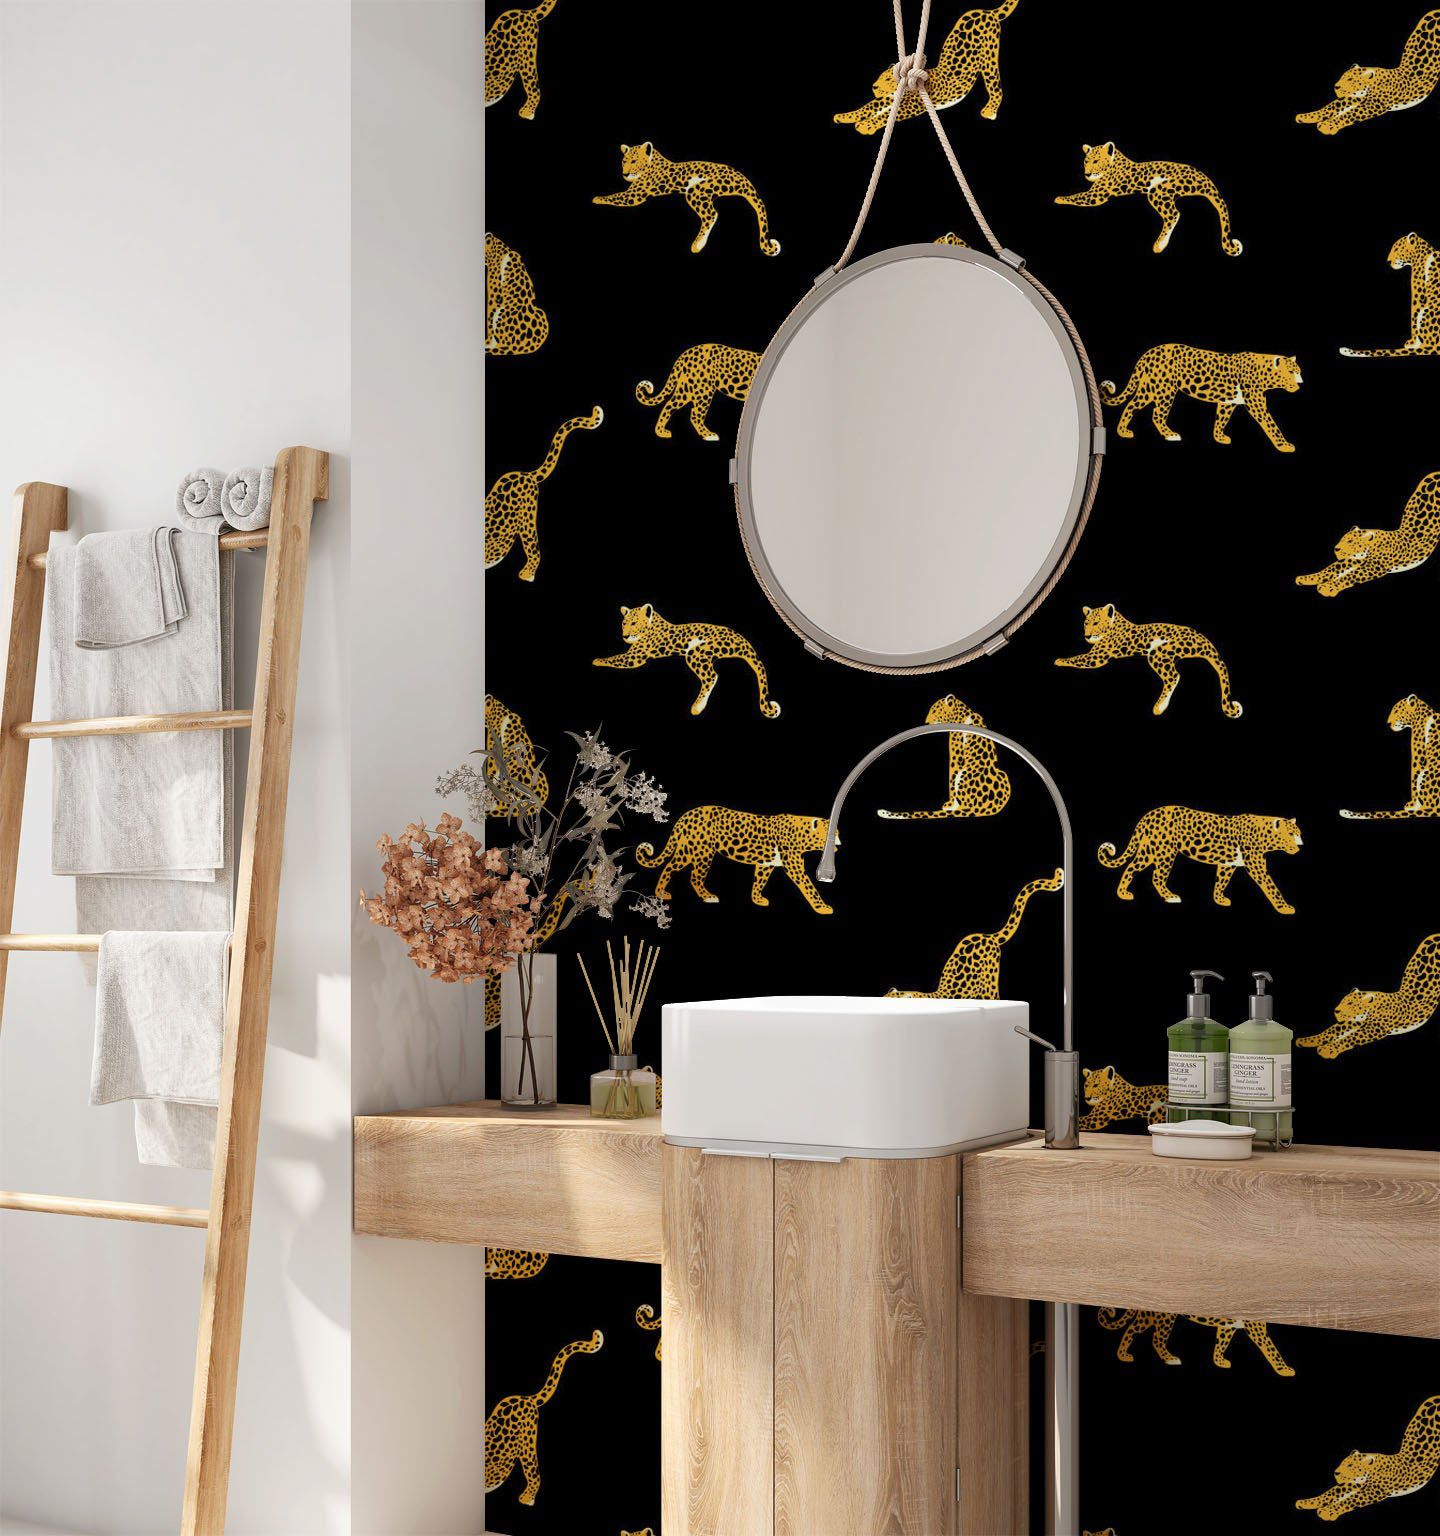 Tropical Removable Wallpaper Leopard Wallpaper Modern Etsy Leopard Wallpaper Modern Wallpaper Removable Wallpaper